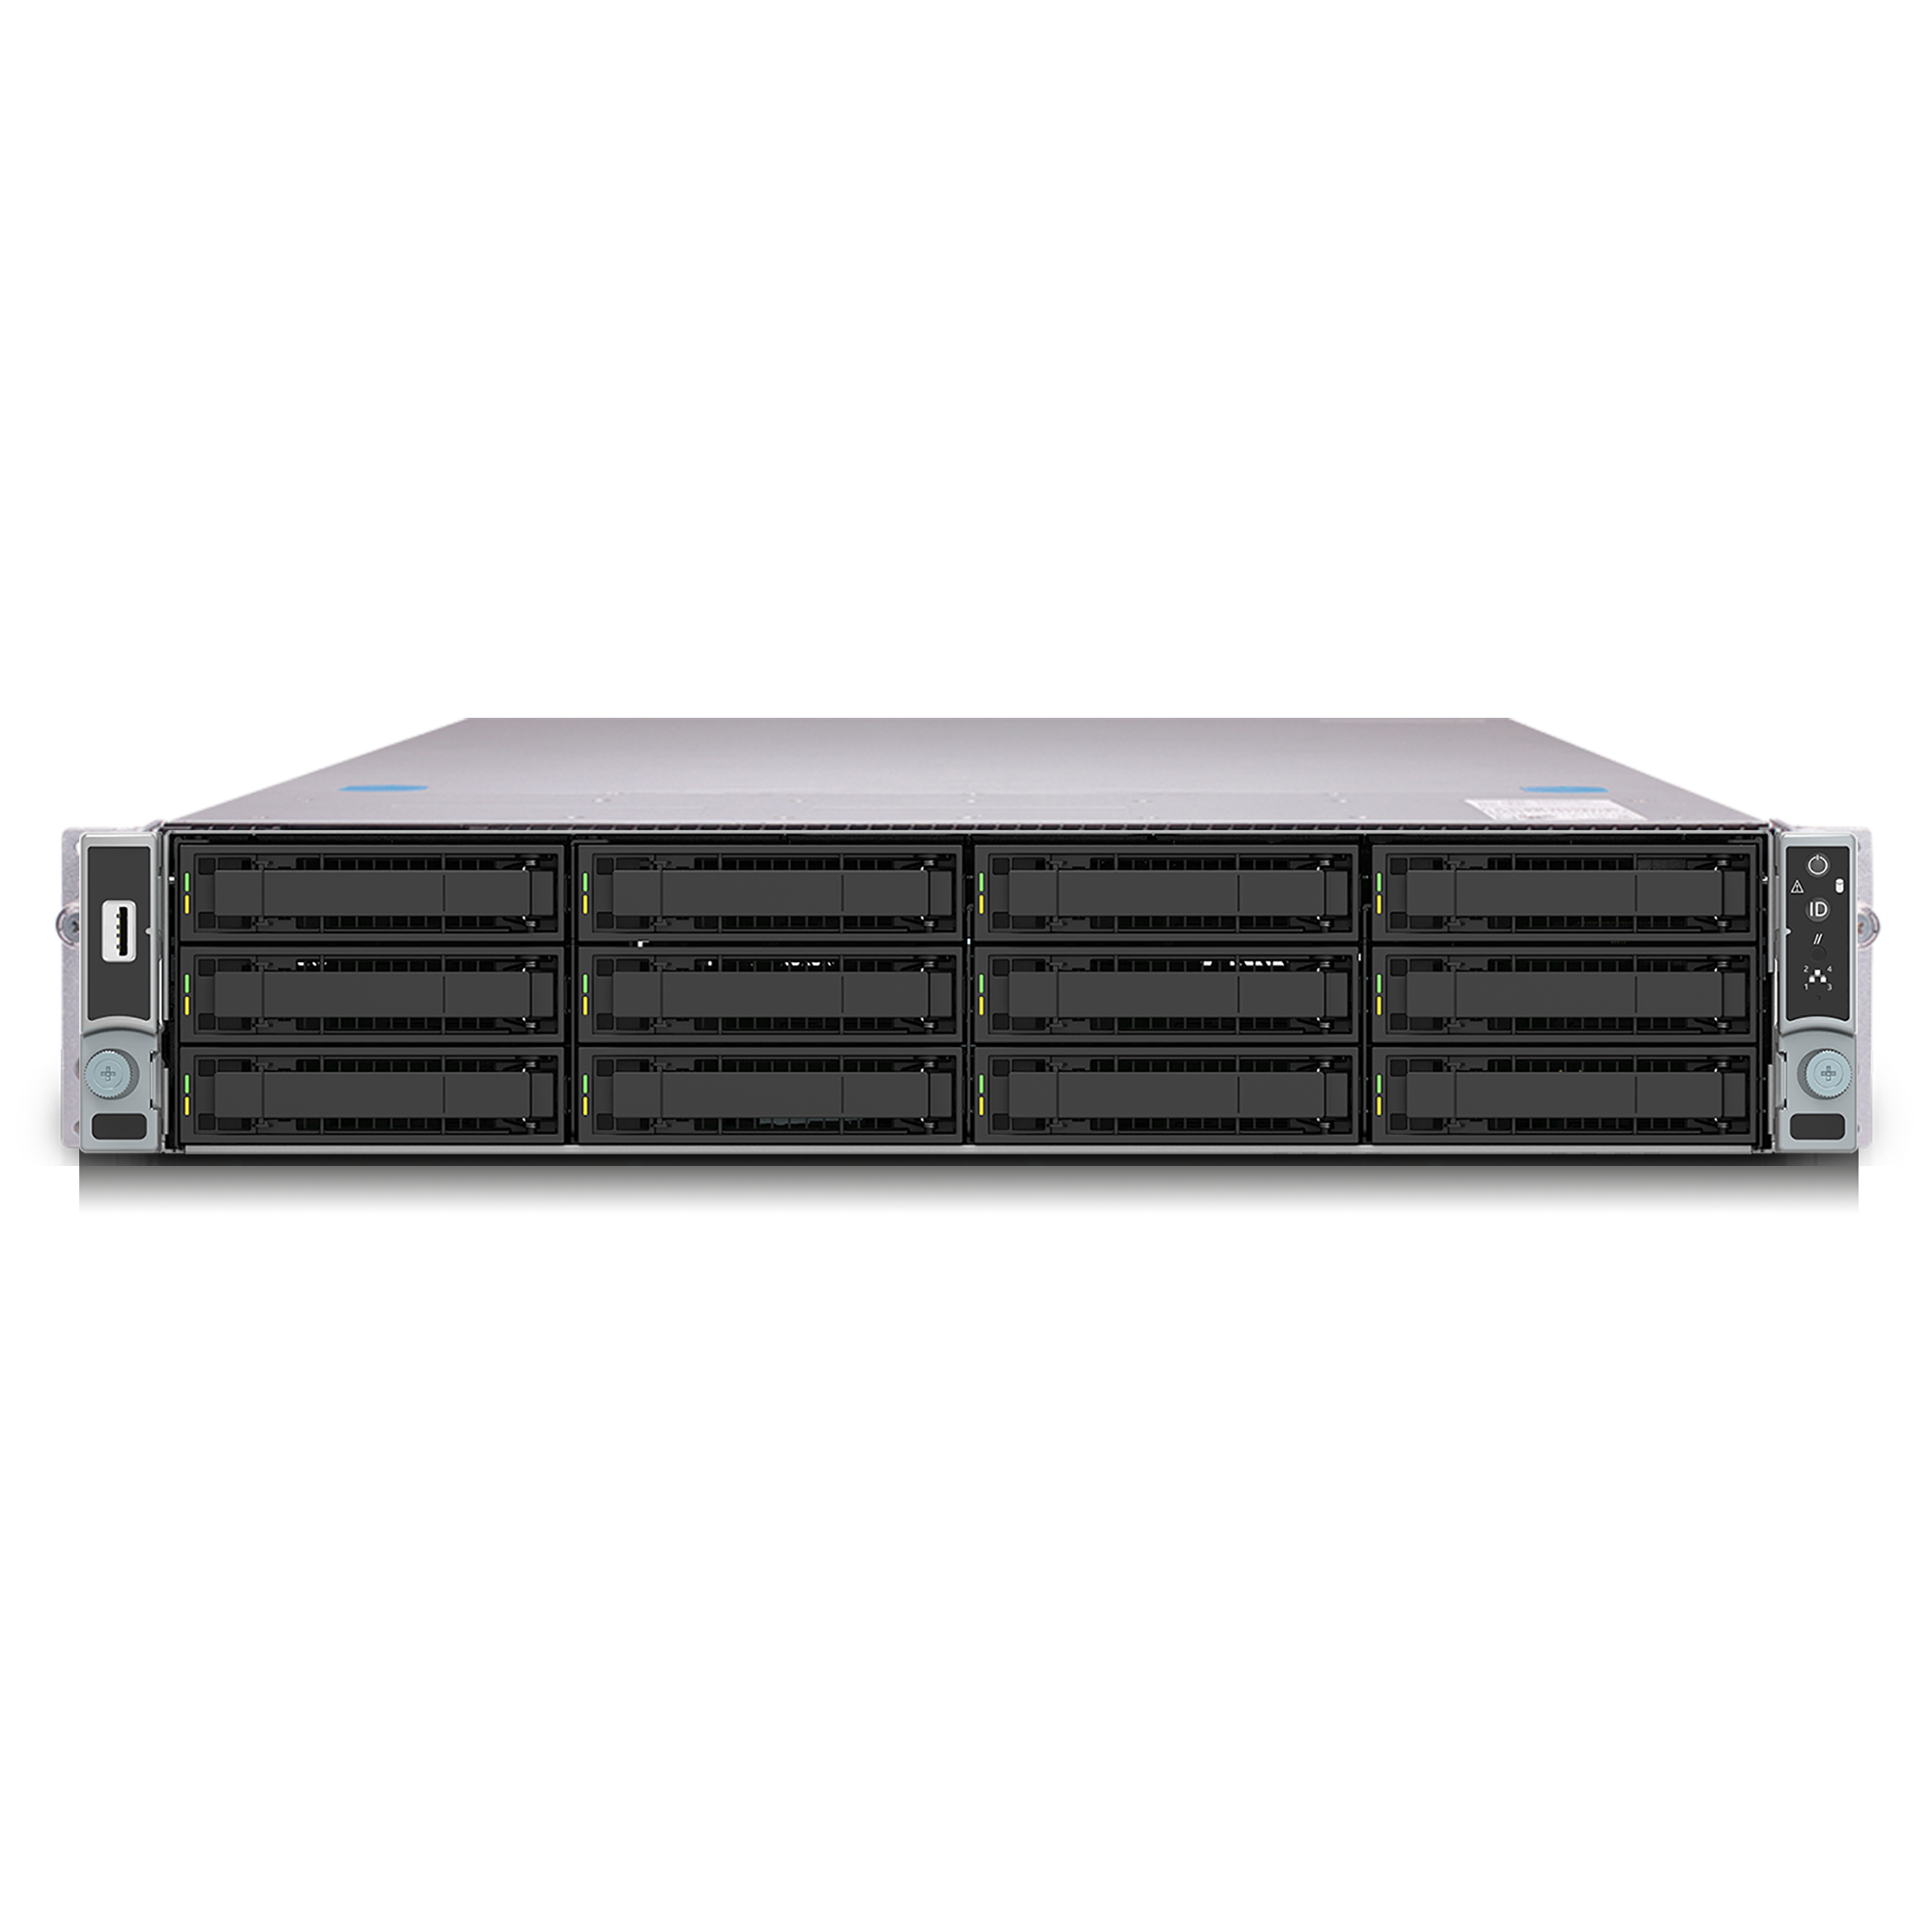 Extrema Server Rack 2U 8 Baie di SiComputer